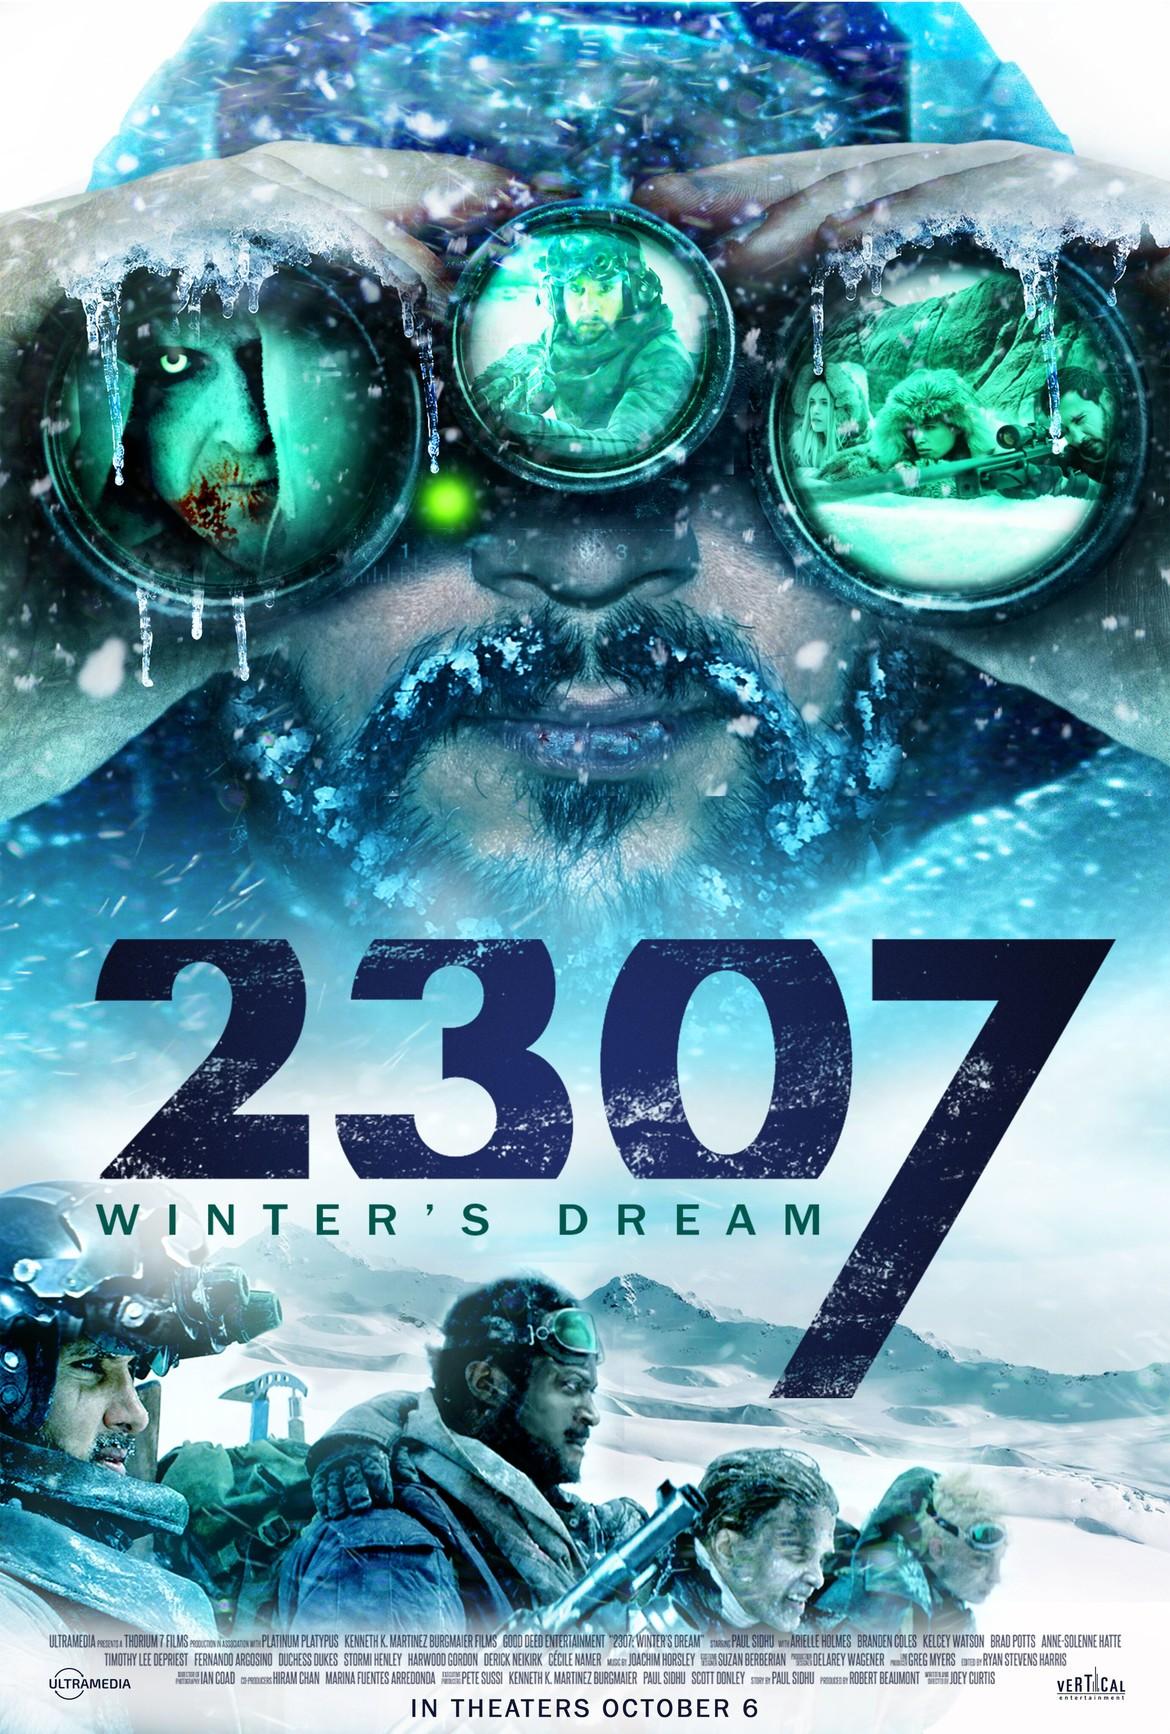 2307WintersDream_Theatrical_Poster.jpg